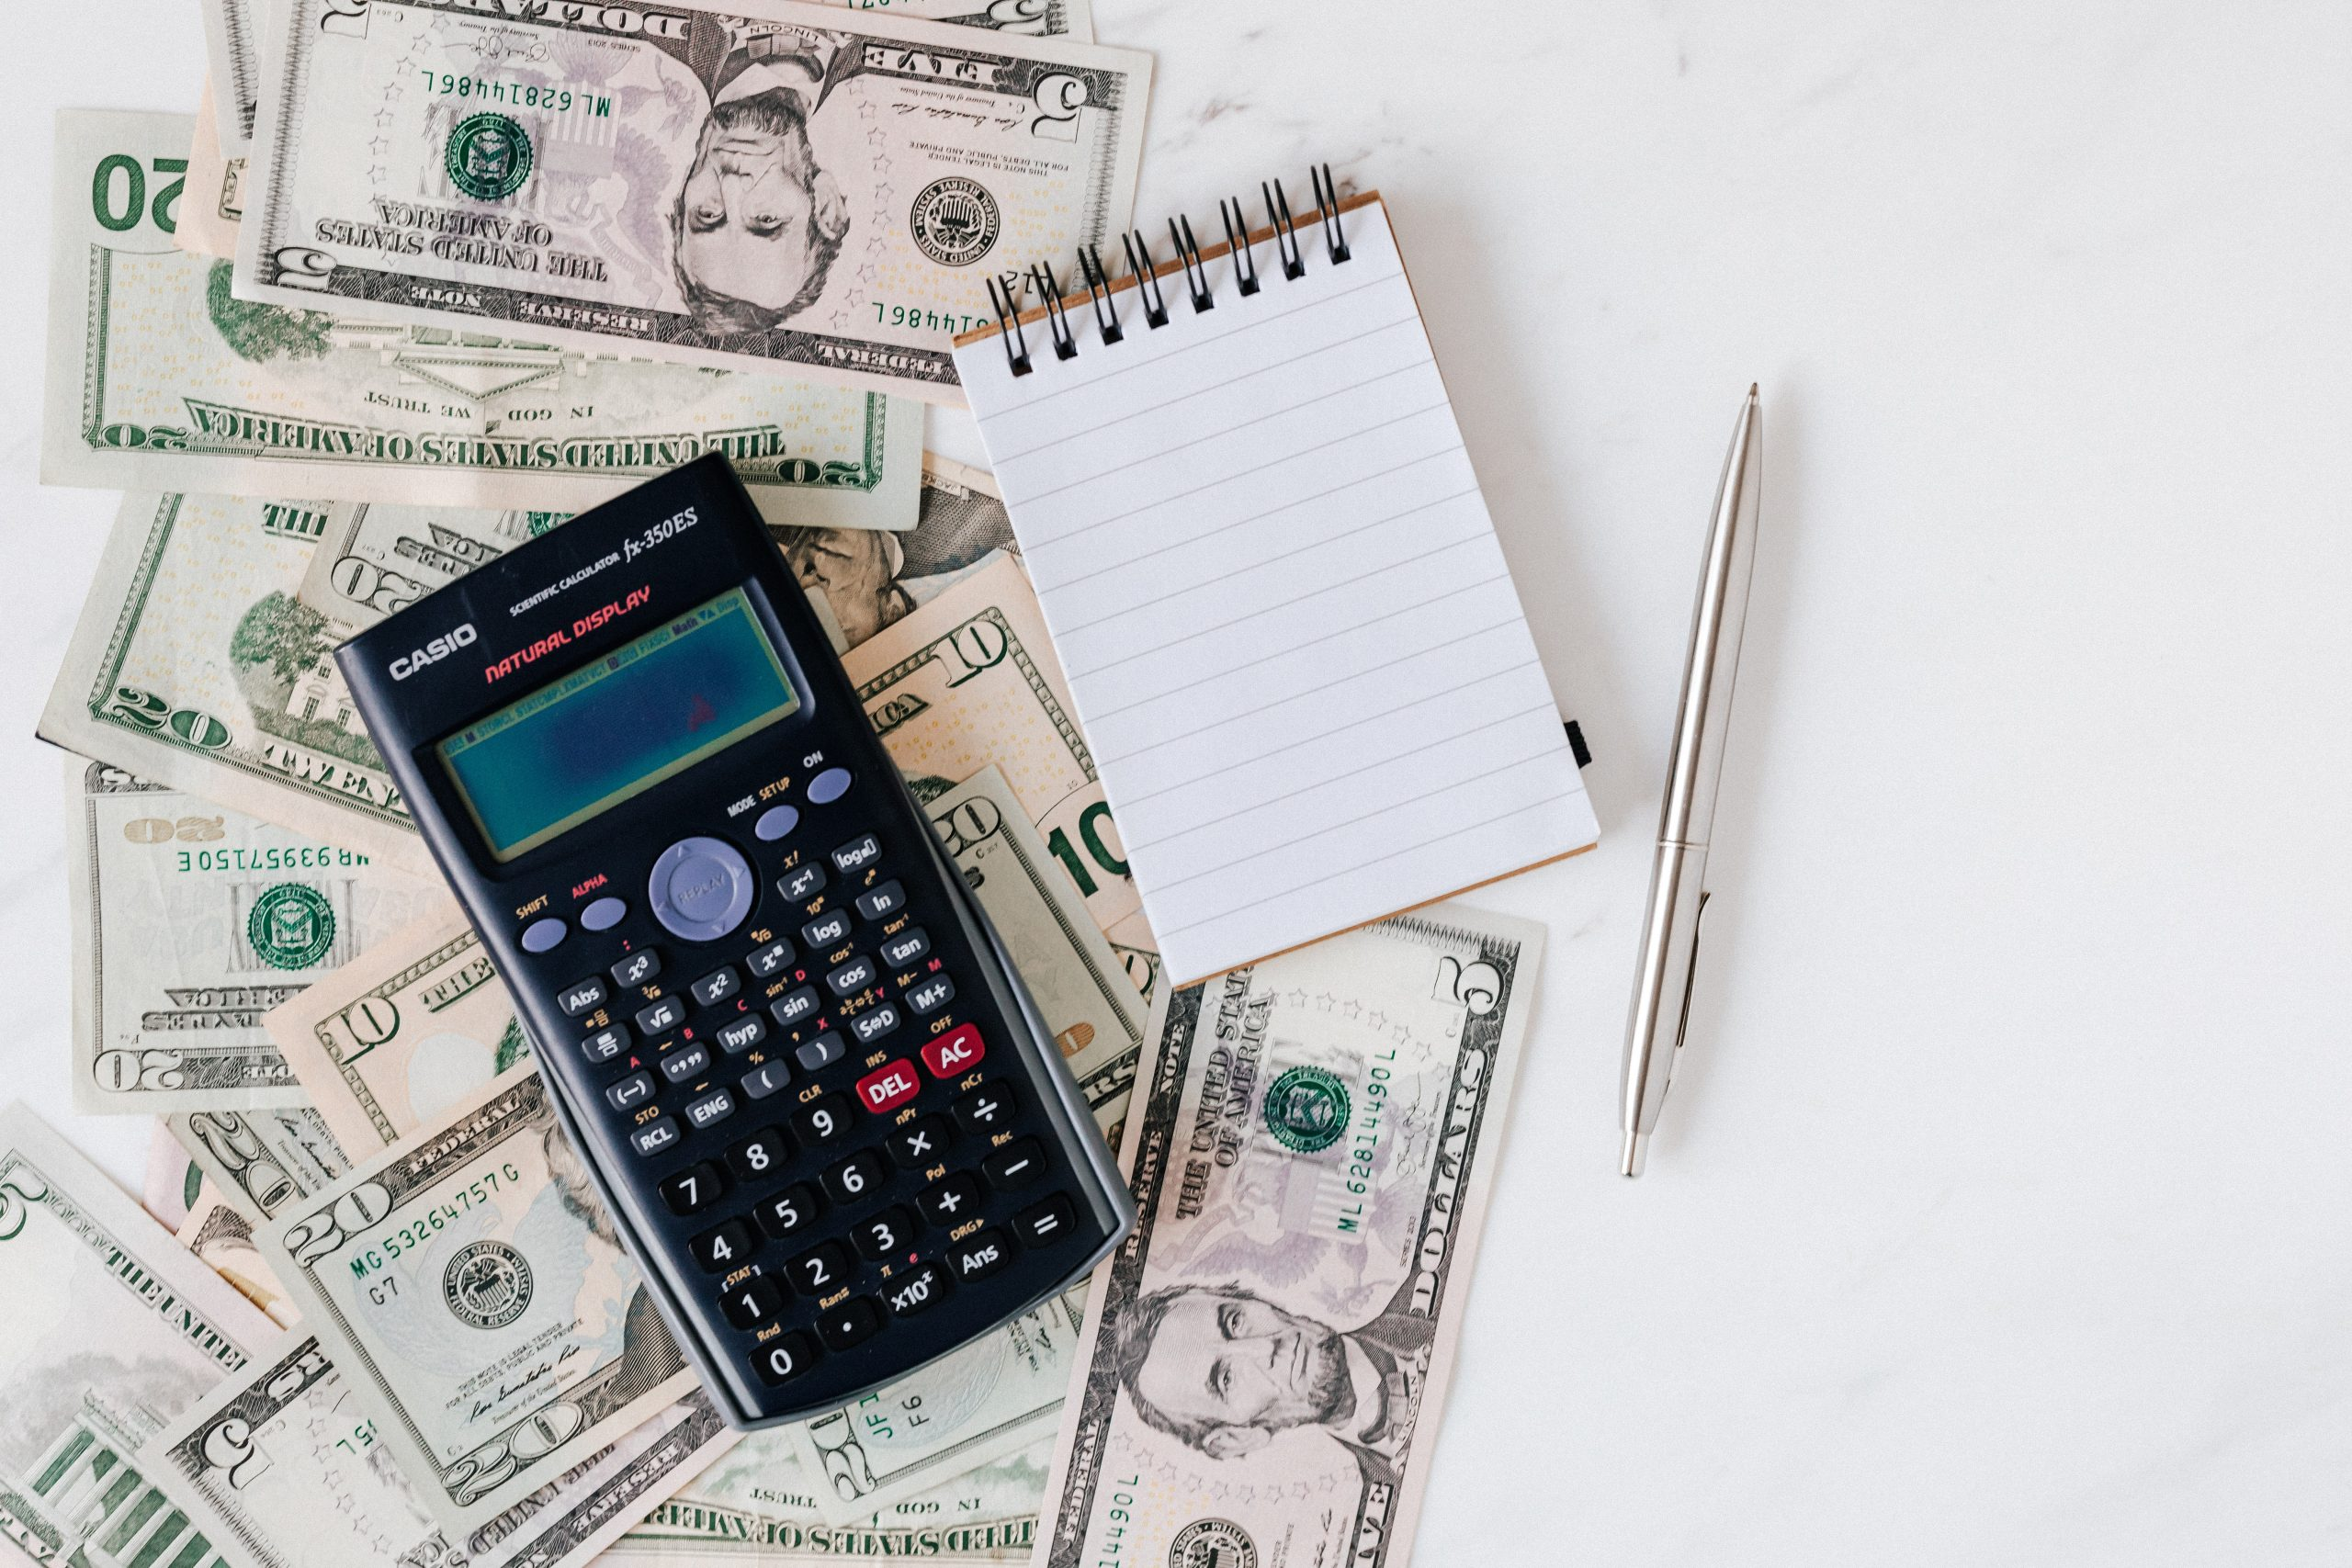 investimento em renda variavel 2